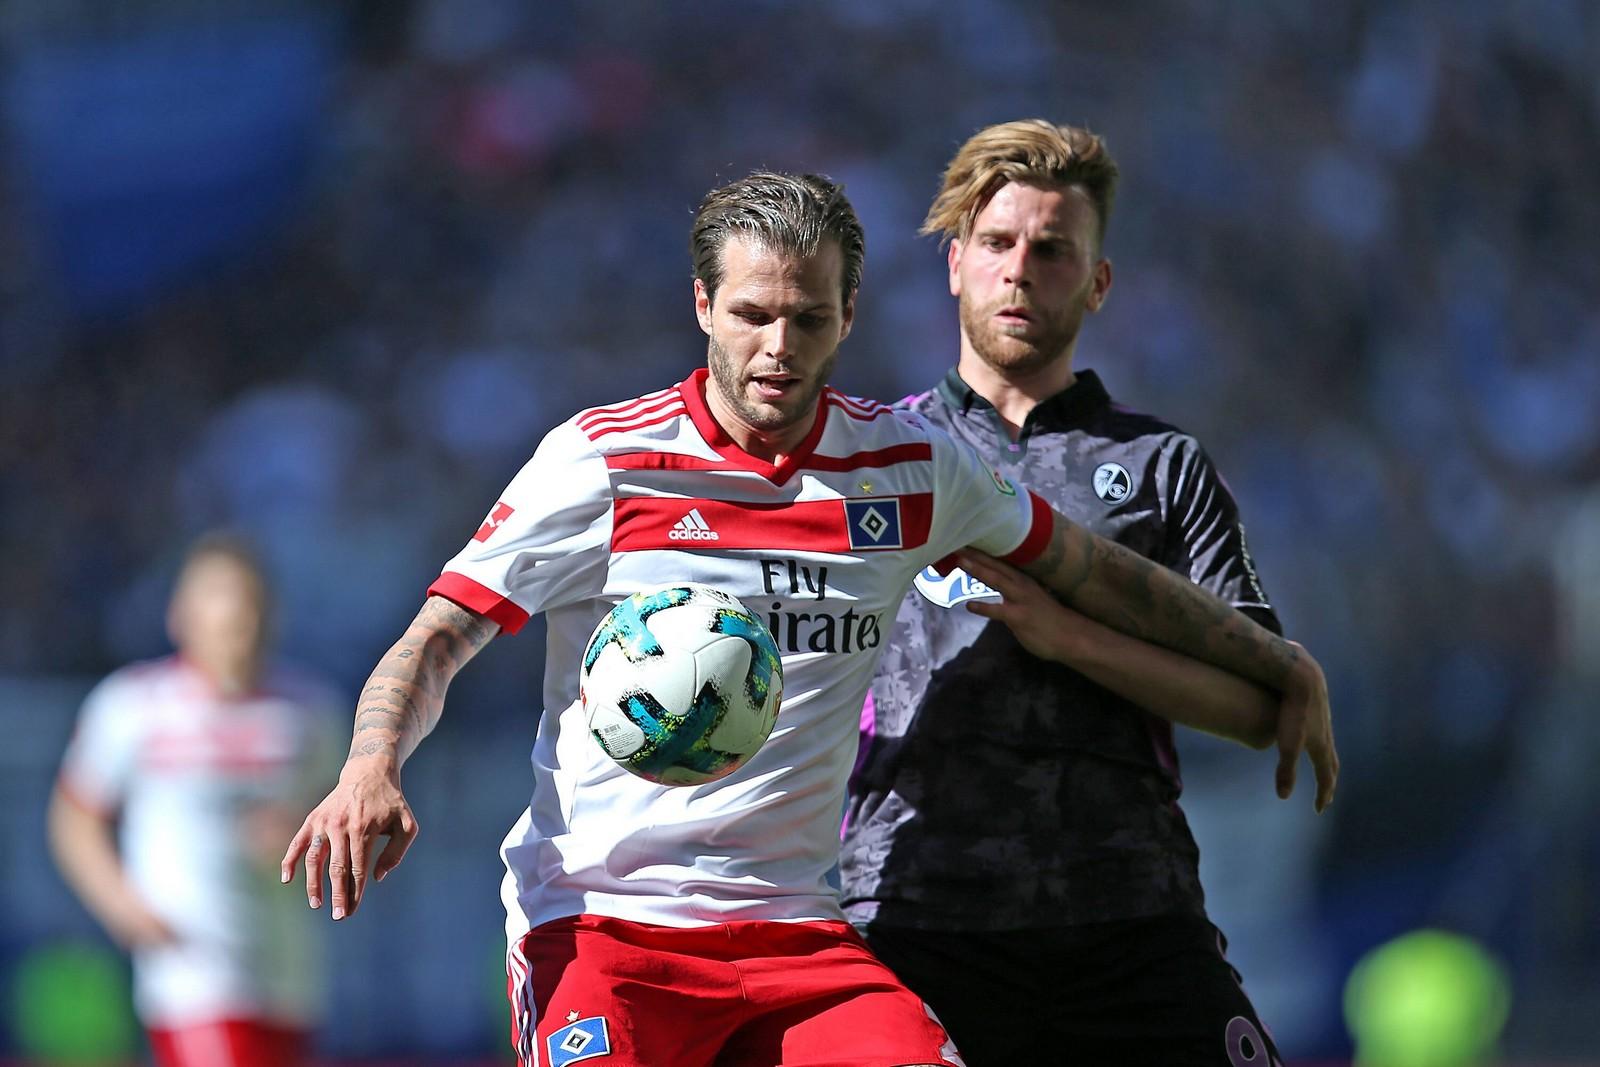 Dennis Diekmeier (v.) im Zweikampf mit Lucas Höler.